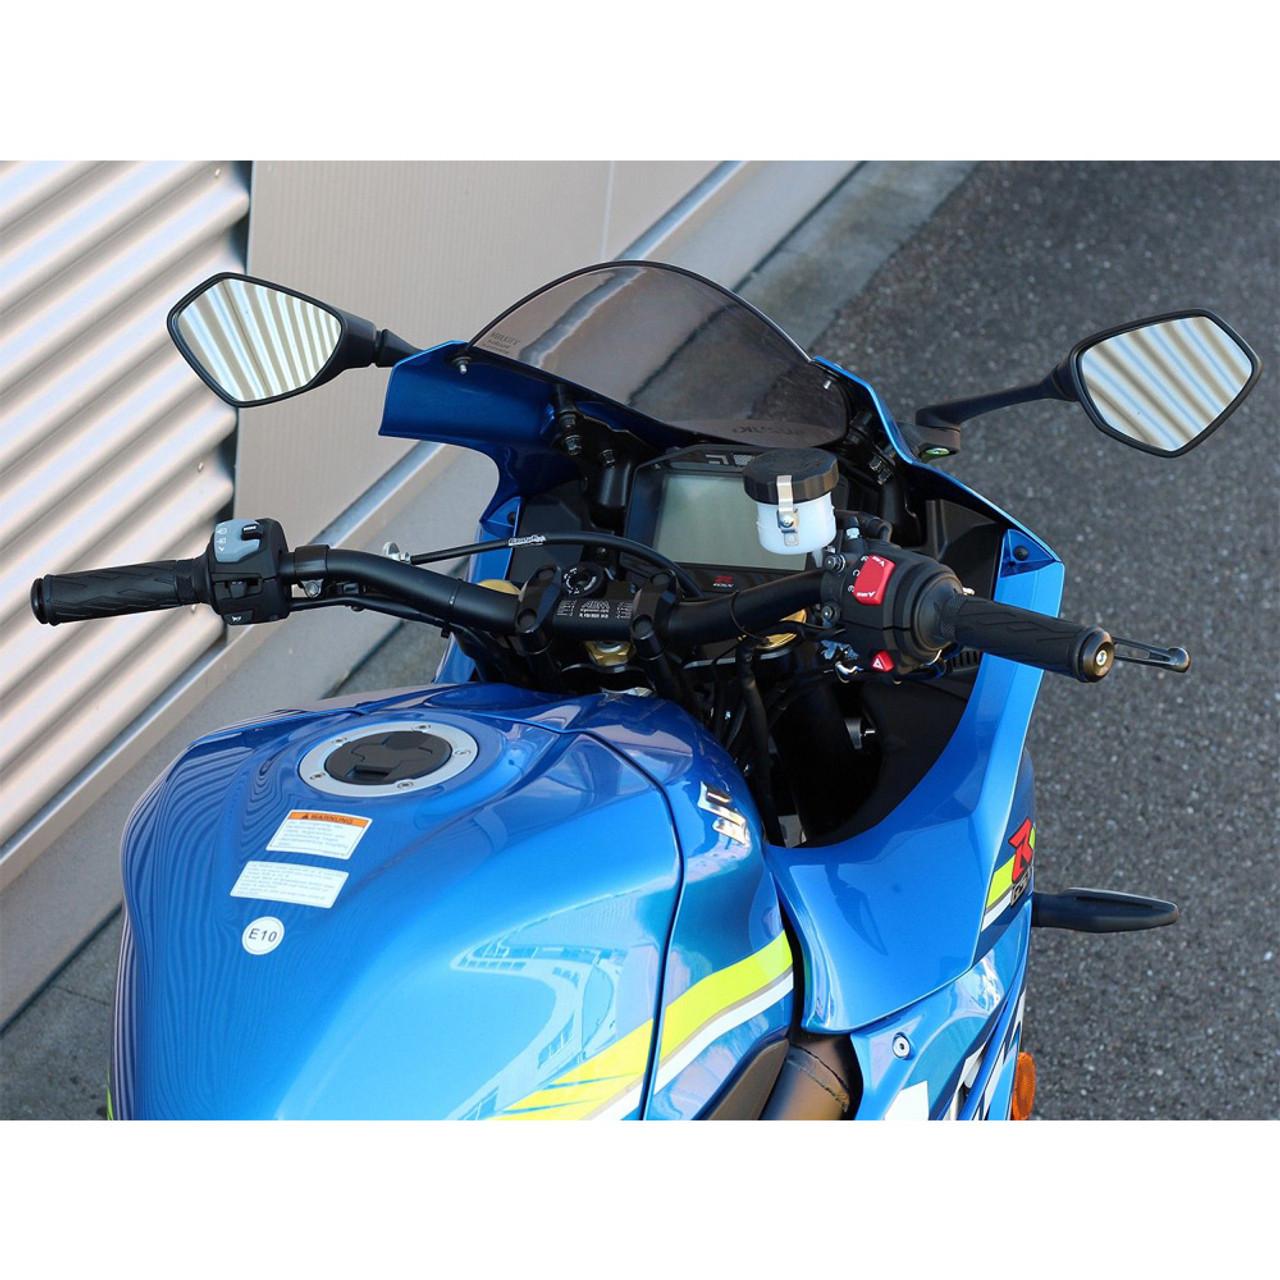 ABM Suzuki GSX-R1000 ABS 17-19 Handlebar Riser Kit